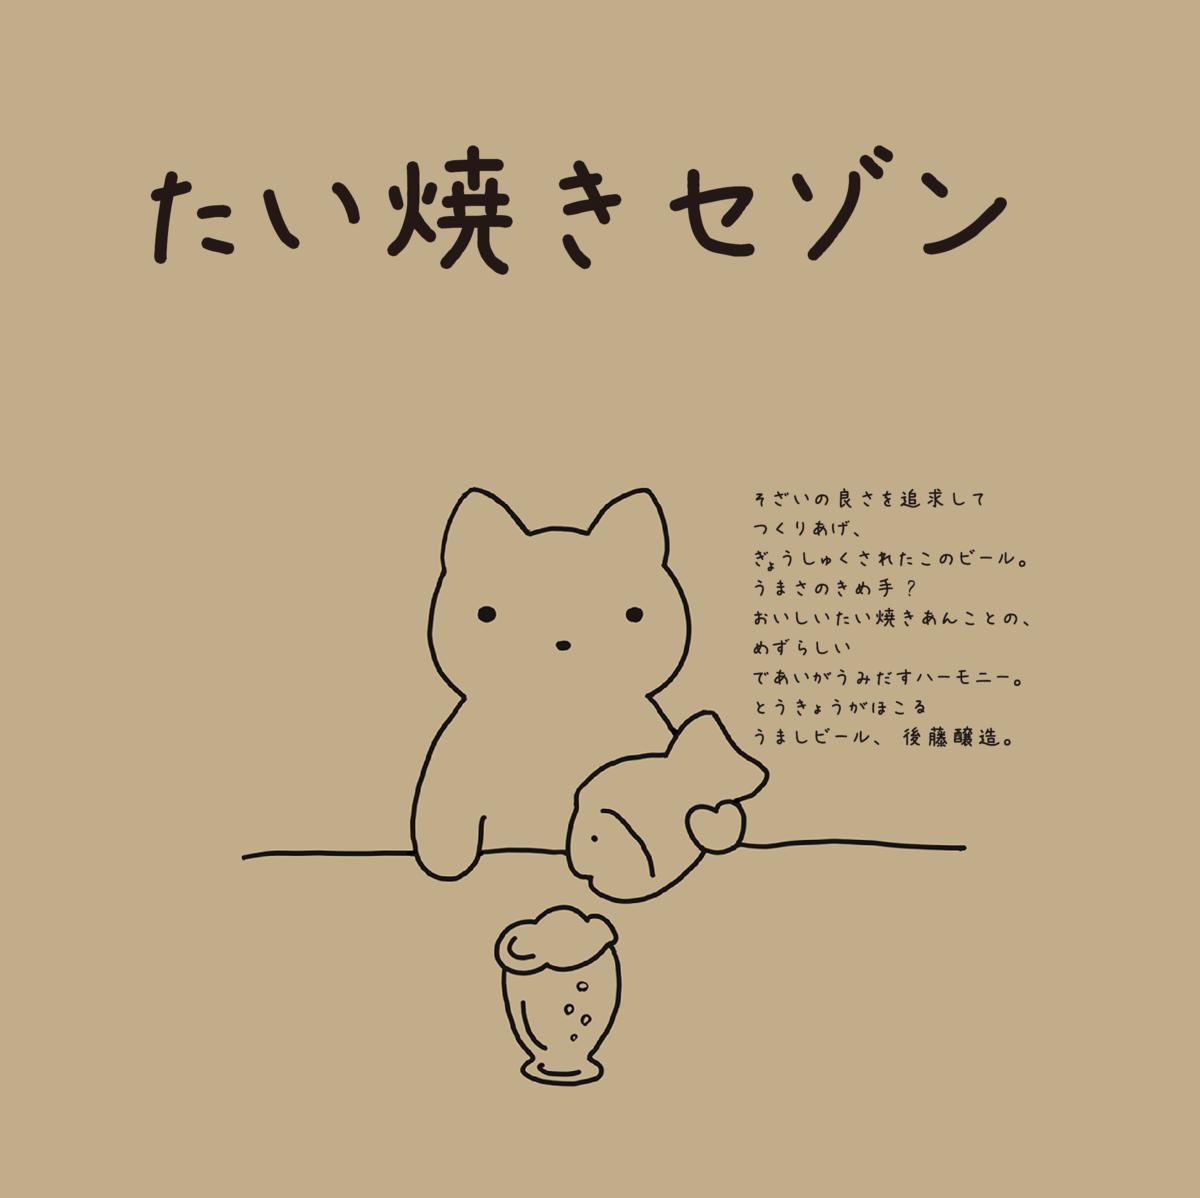 f:id:gotojozo-blog:20200228162057p:plain:w450